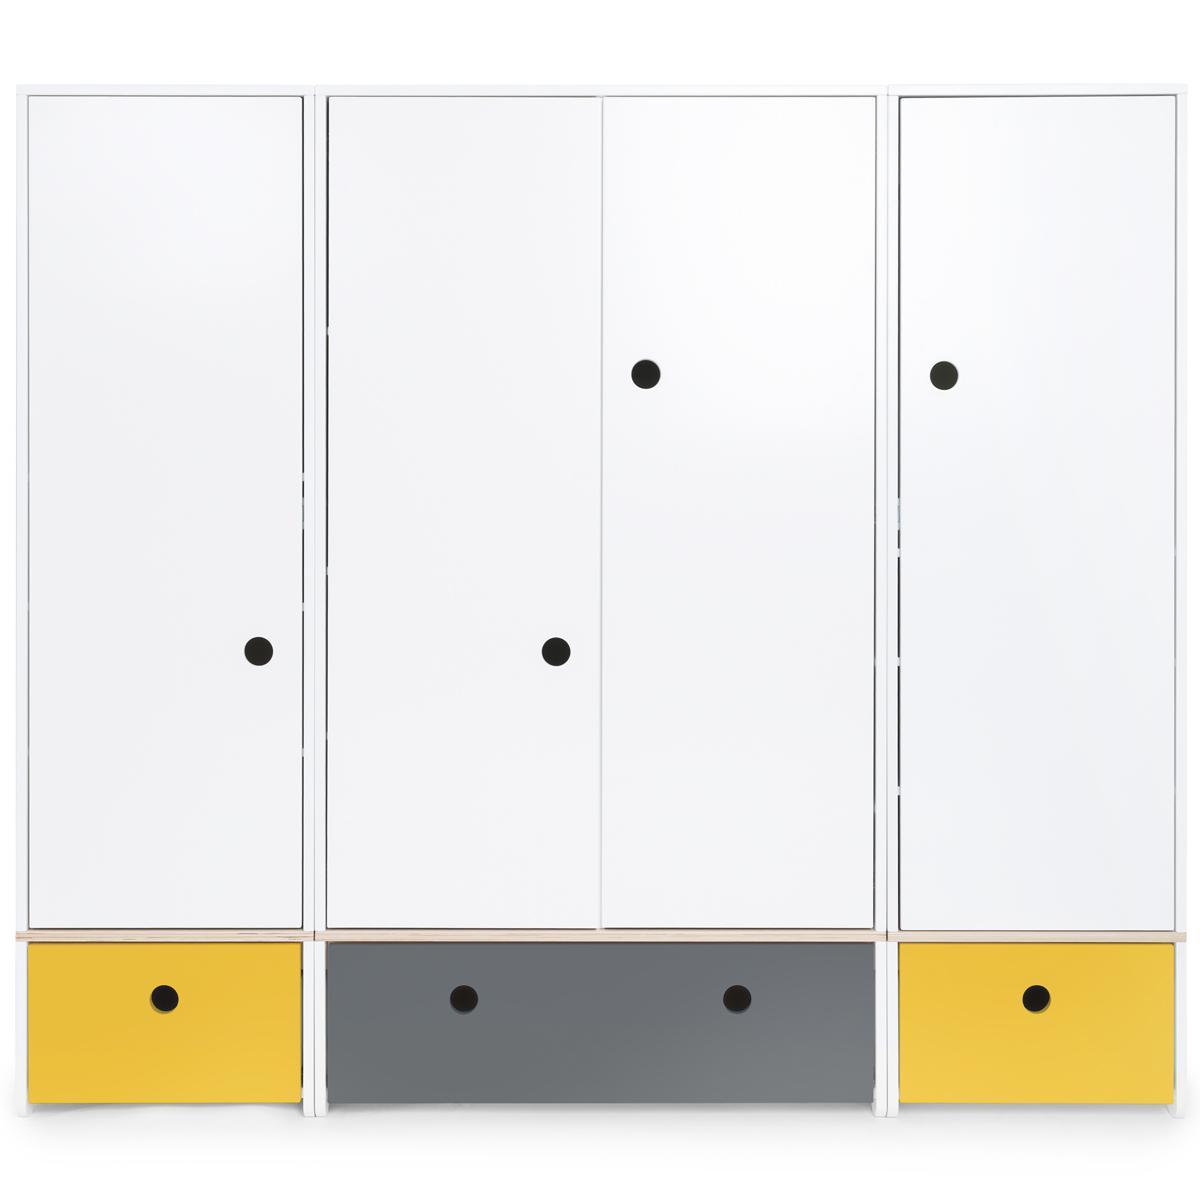 Armario 4 puertas COLORFLEX Abitare Kids cajones frontales nectar yellow-space grey-nectar yellow